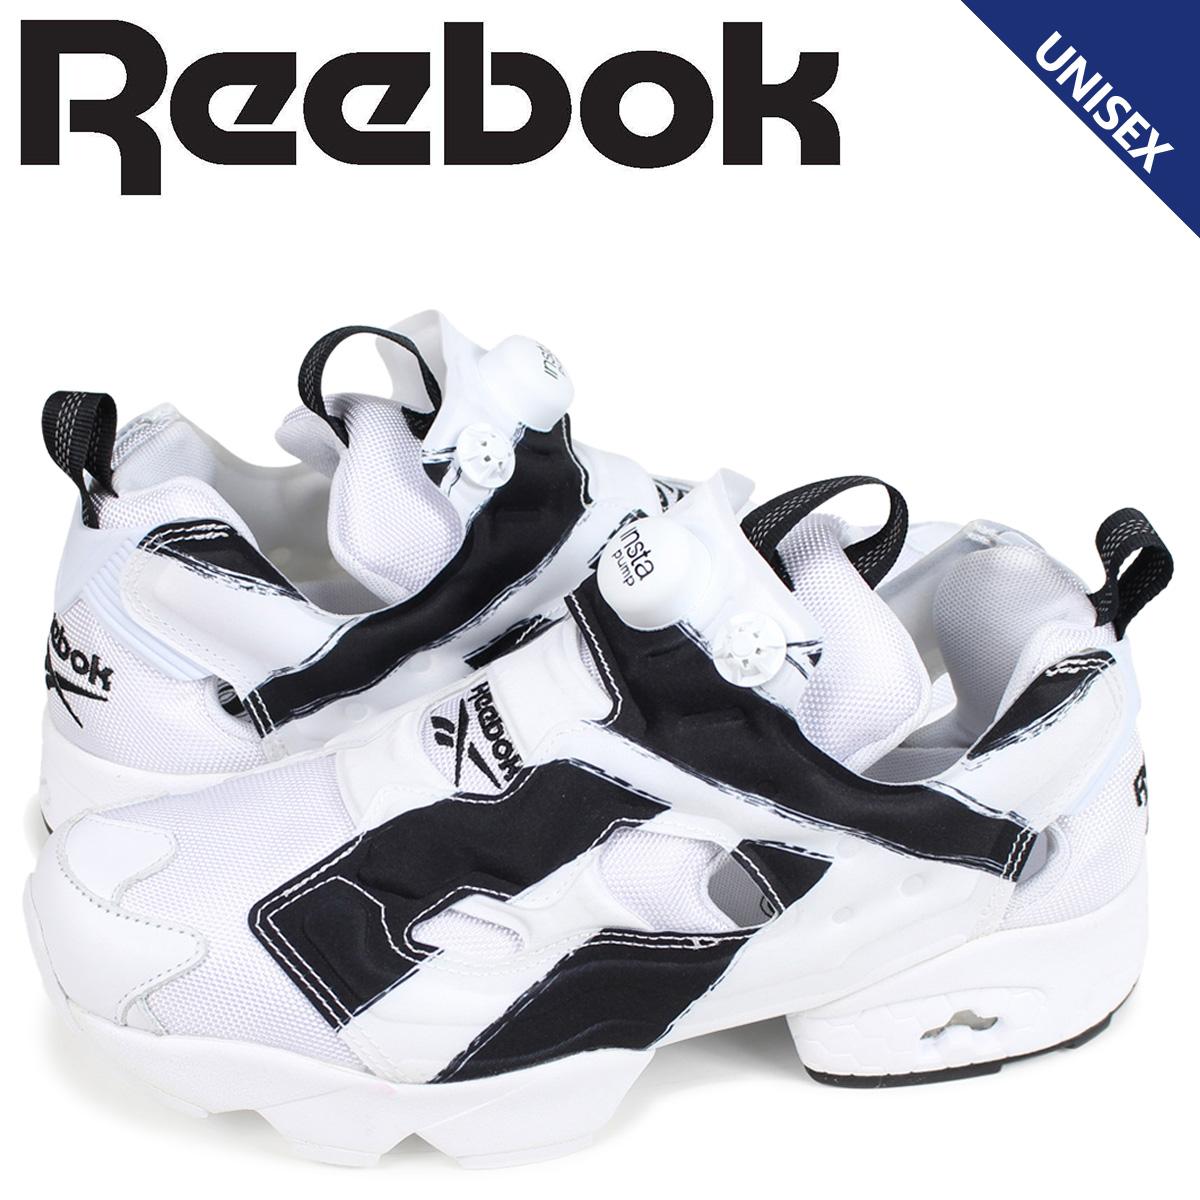 5f3fc9d71a0 Reebok pump fury Womens mens sneakers Reebok INSTAPUMP FURY OB AR1413 shoes  white  10 14 new in stock